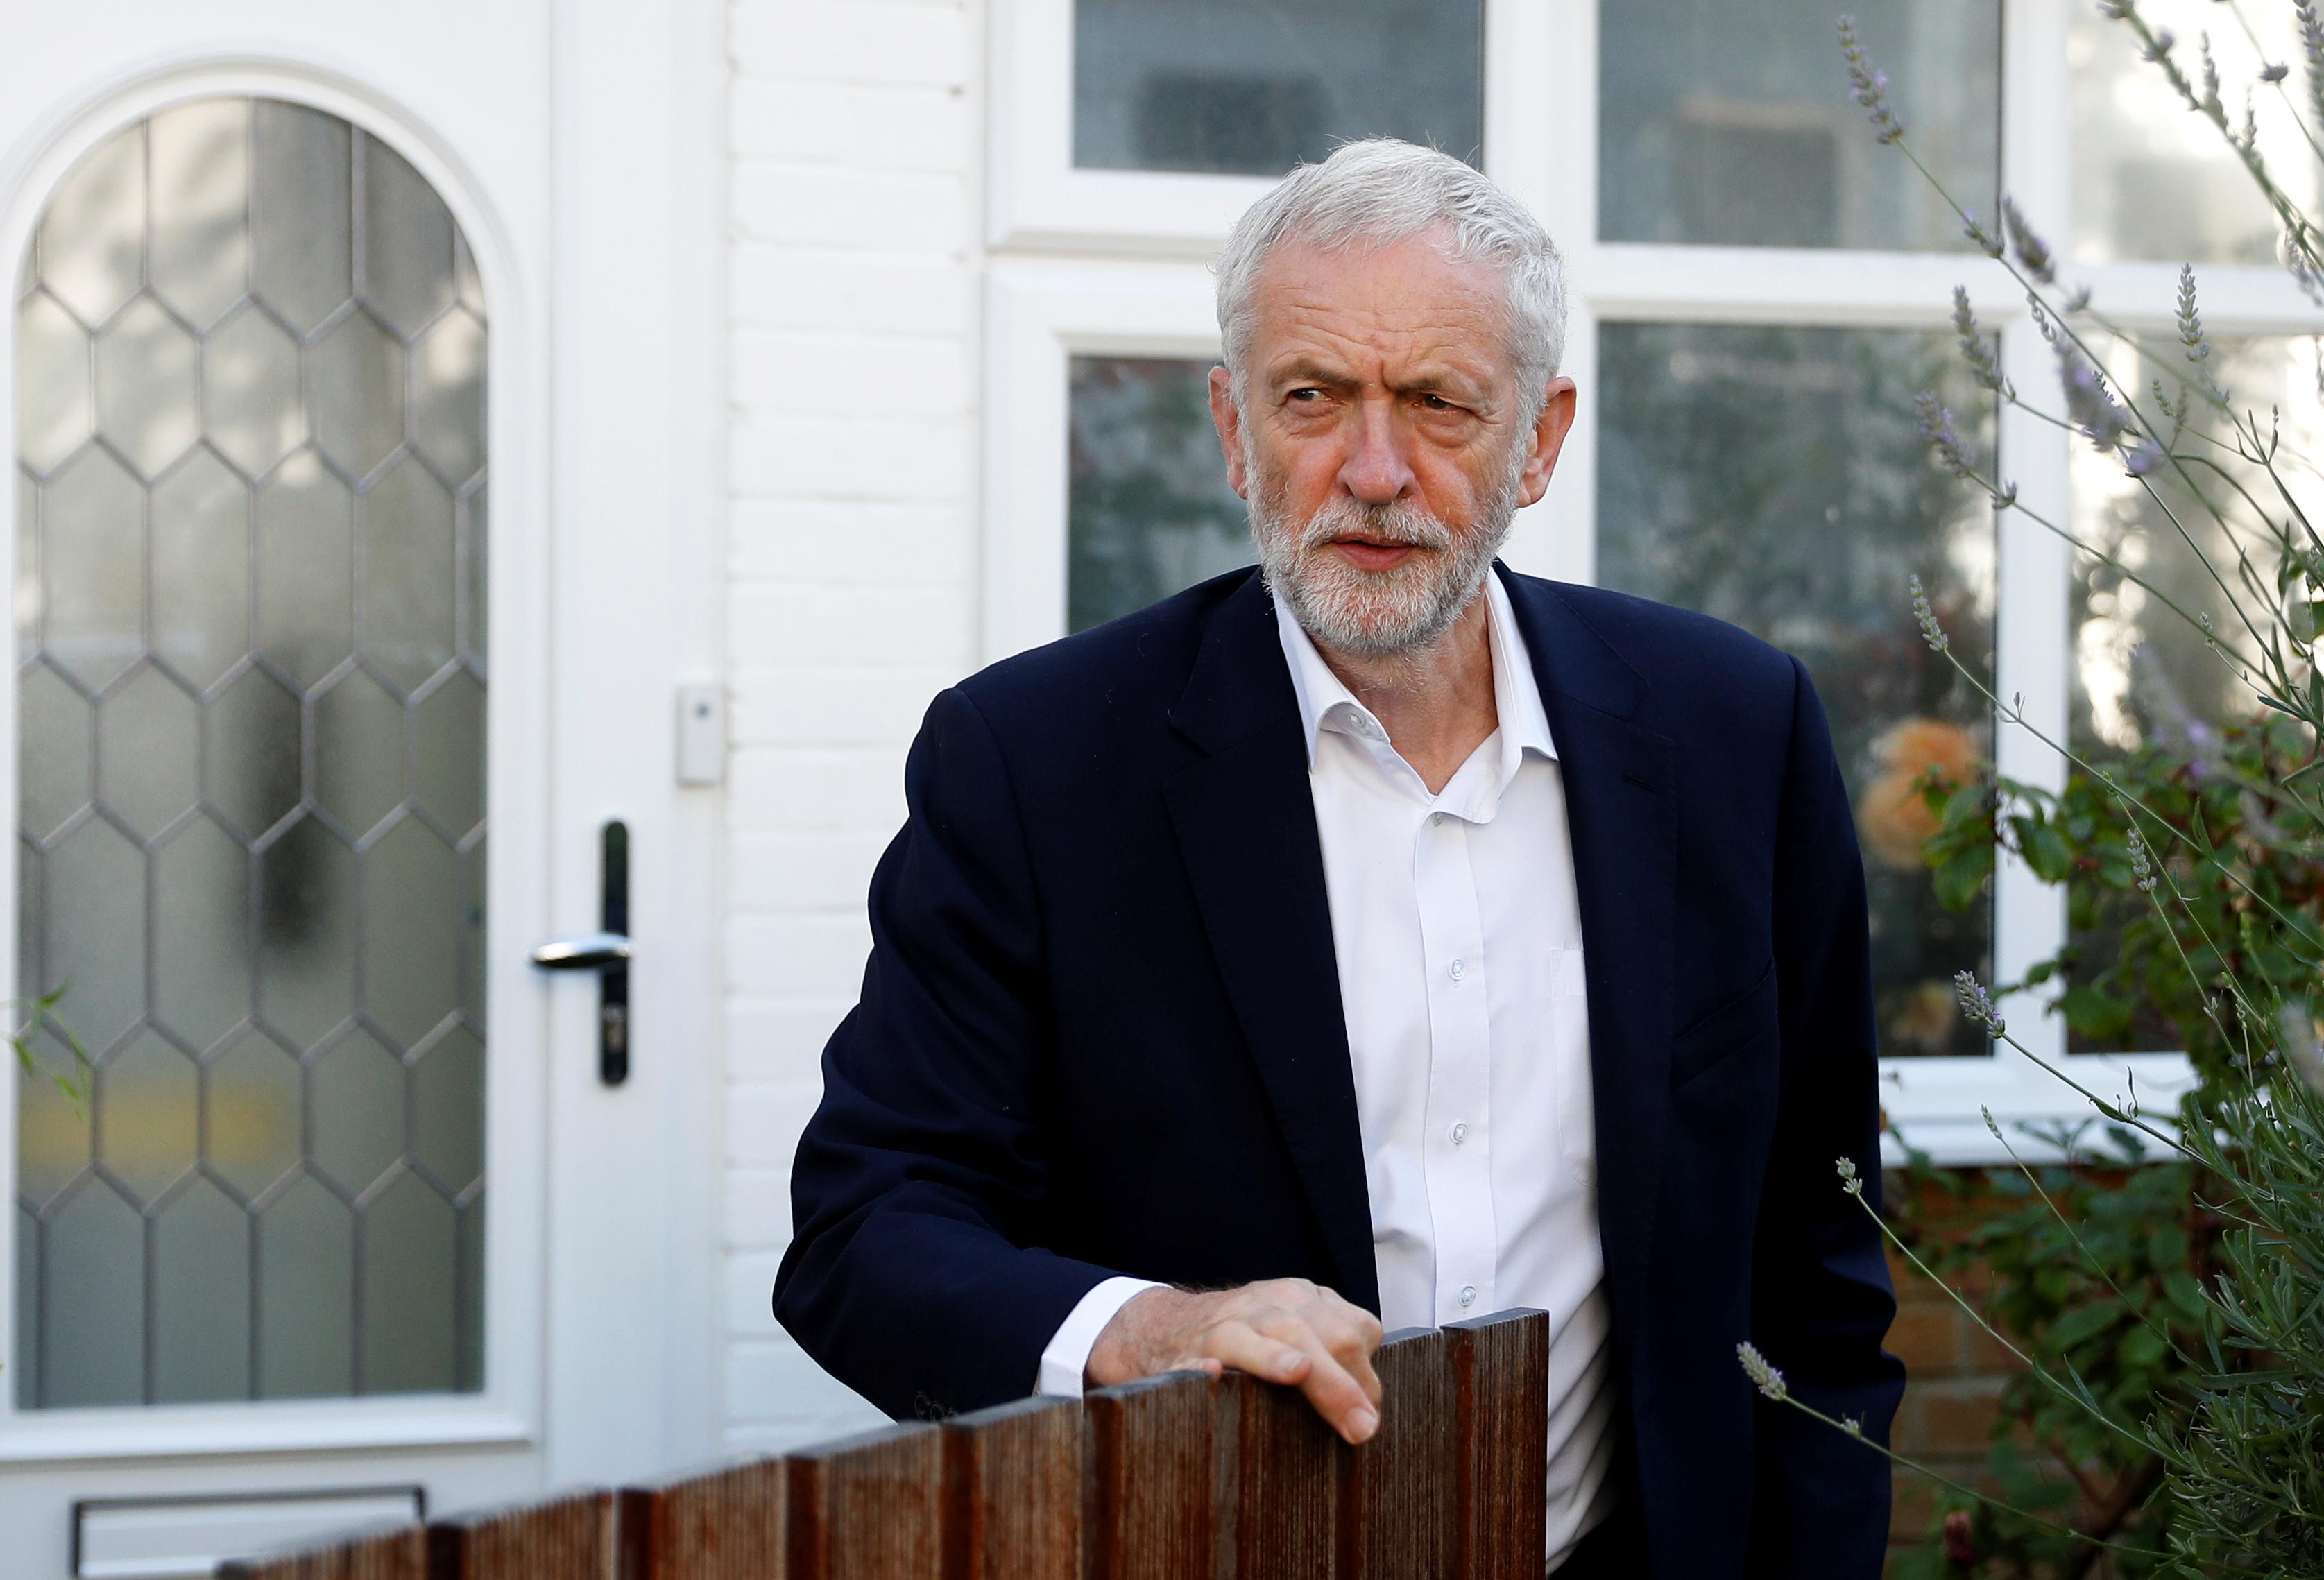 Brexit: Νέο δημοψήφισμα ζητά ο Τζέρεμι Κόρμπιν από τον επόμενο πρωθυπουργό